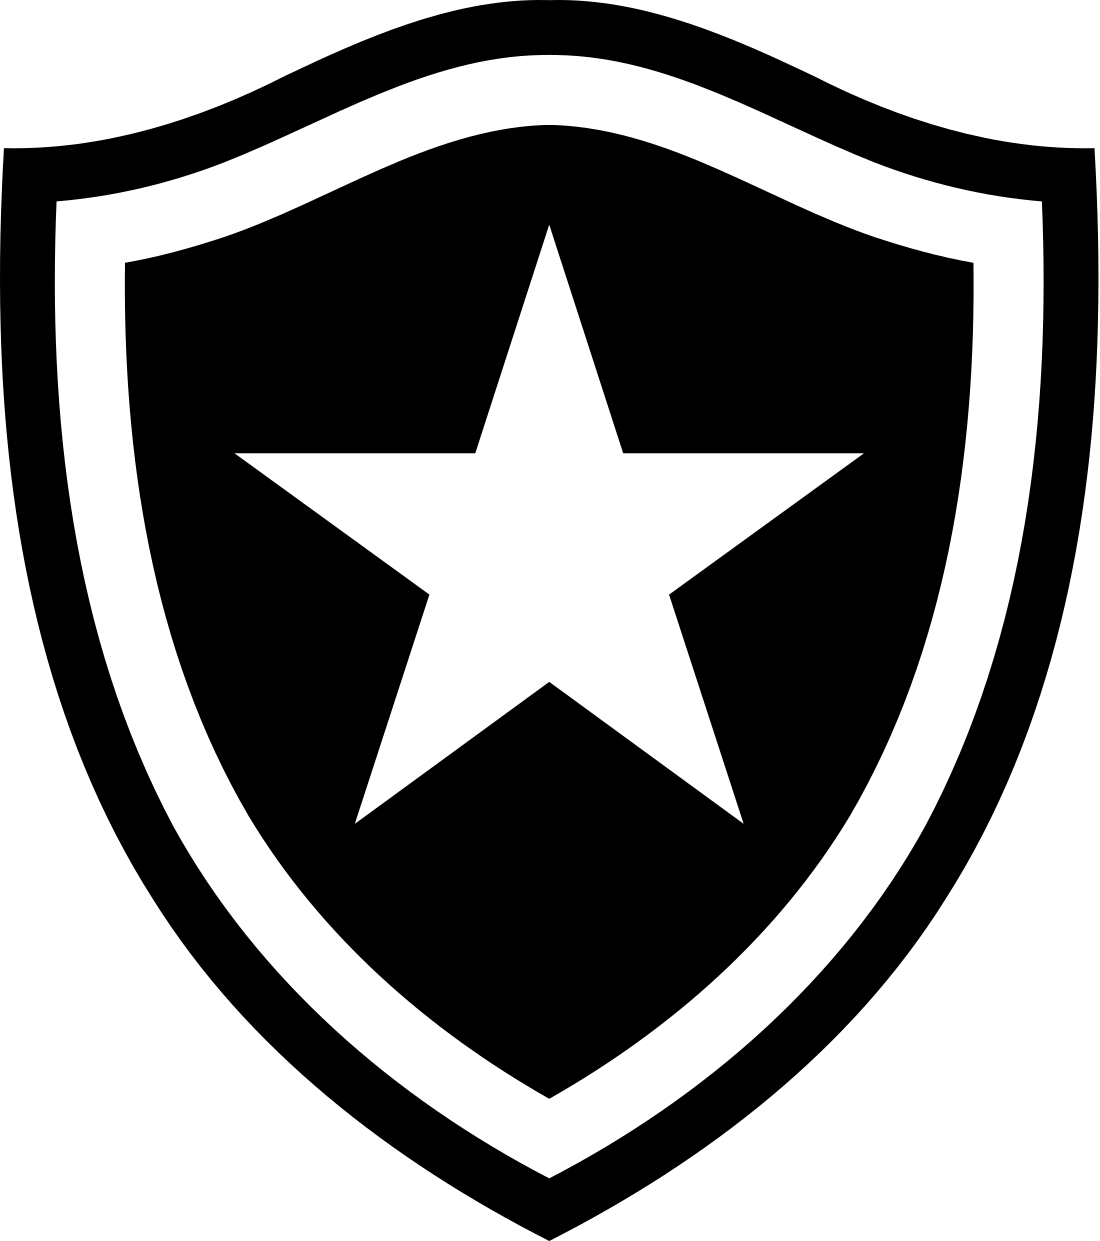 botafogo logo escudo 3 - Botafogo Logo - Escudo